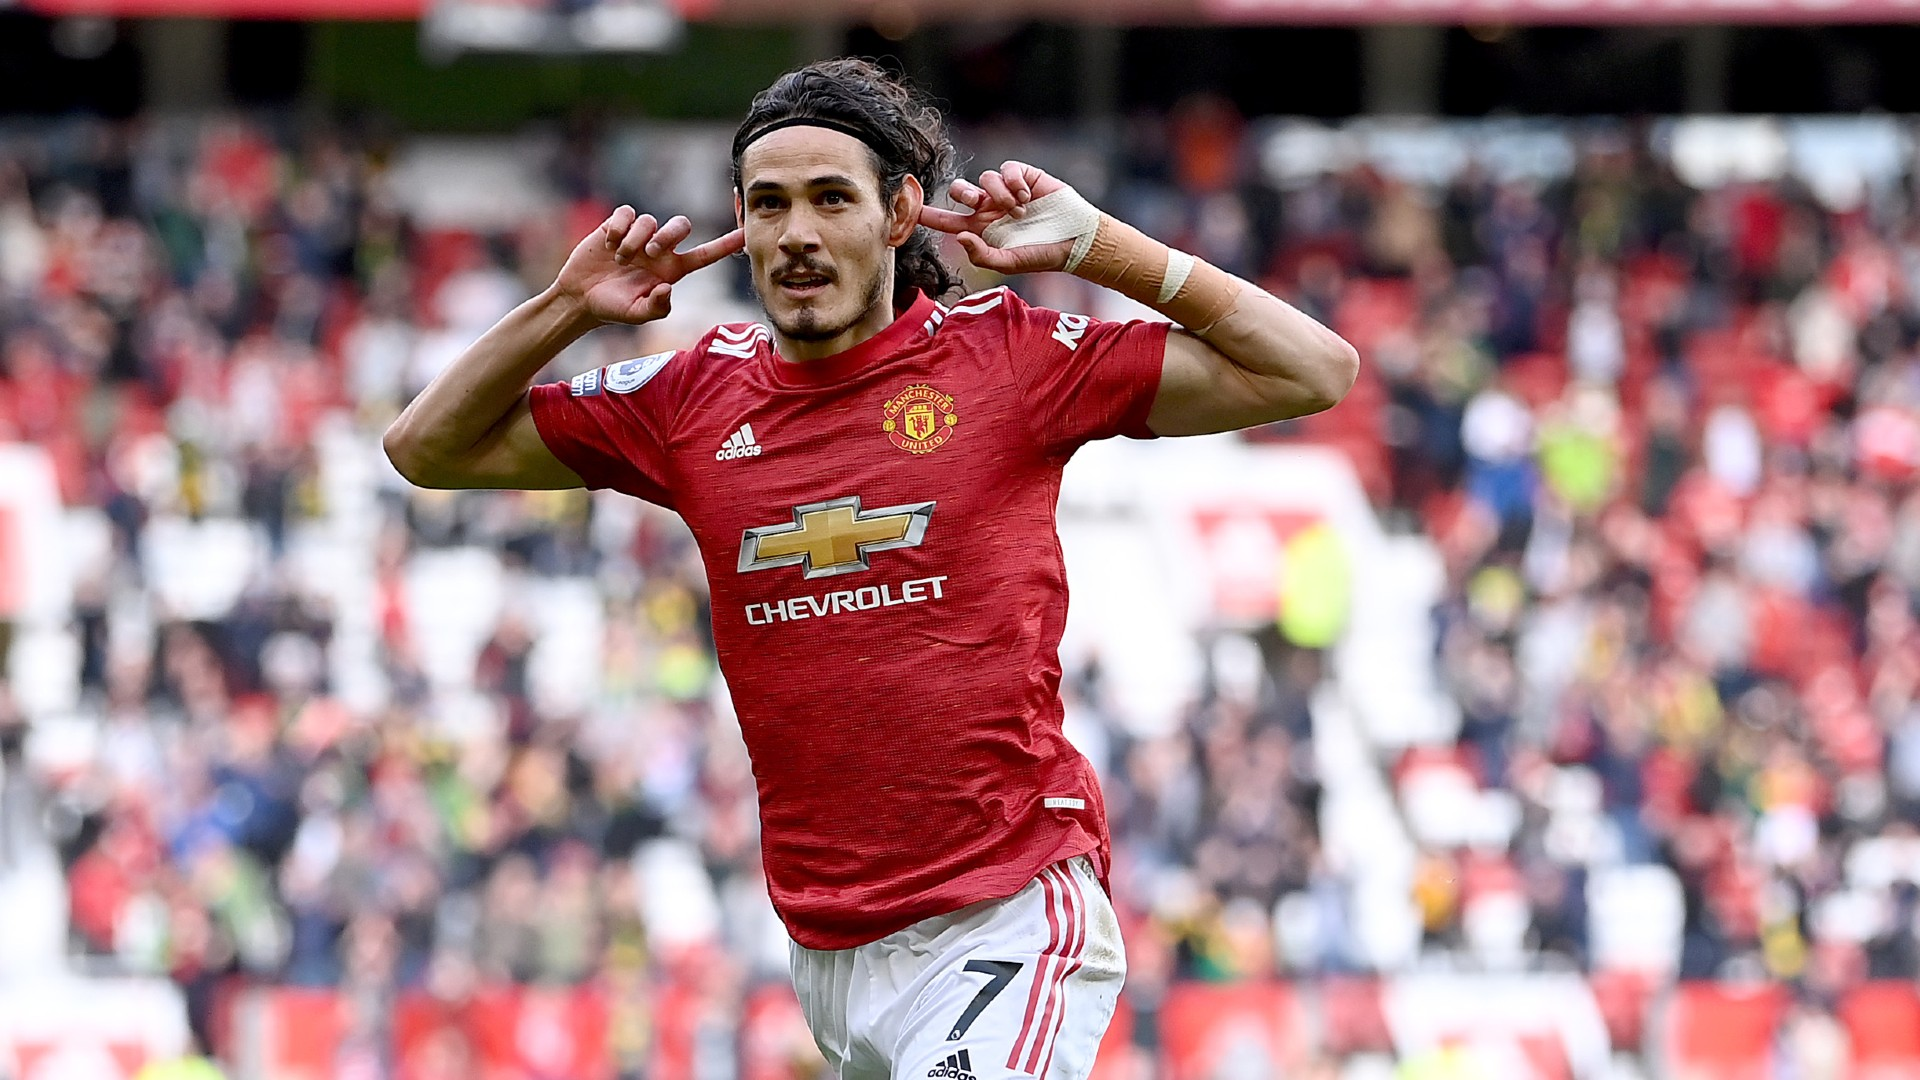 Fan View: 'What a goal!' – Manchester United's African fans hail Cavani's screamer